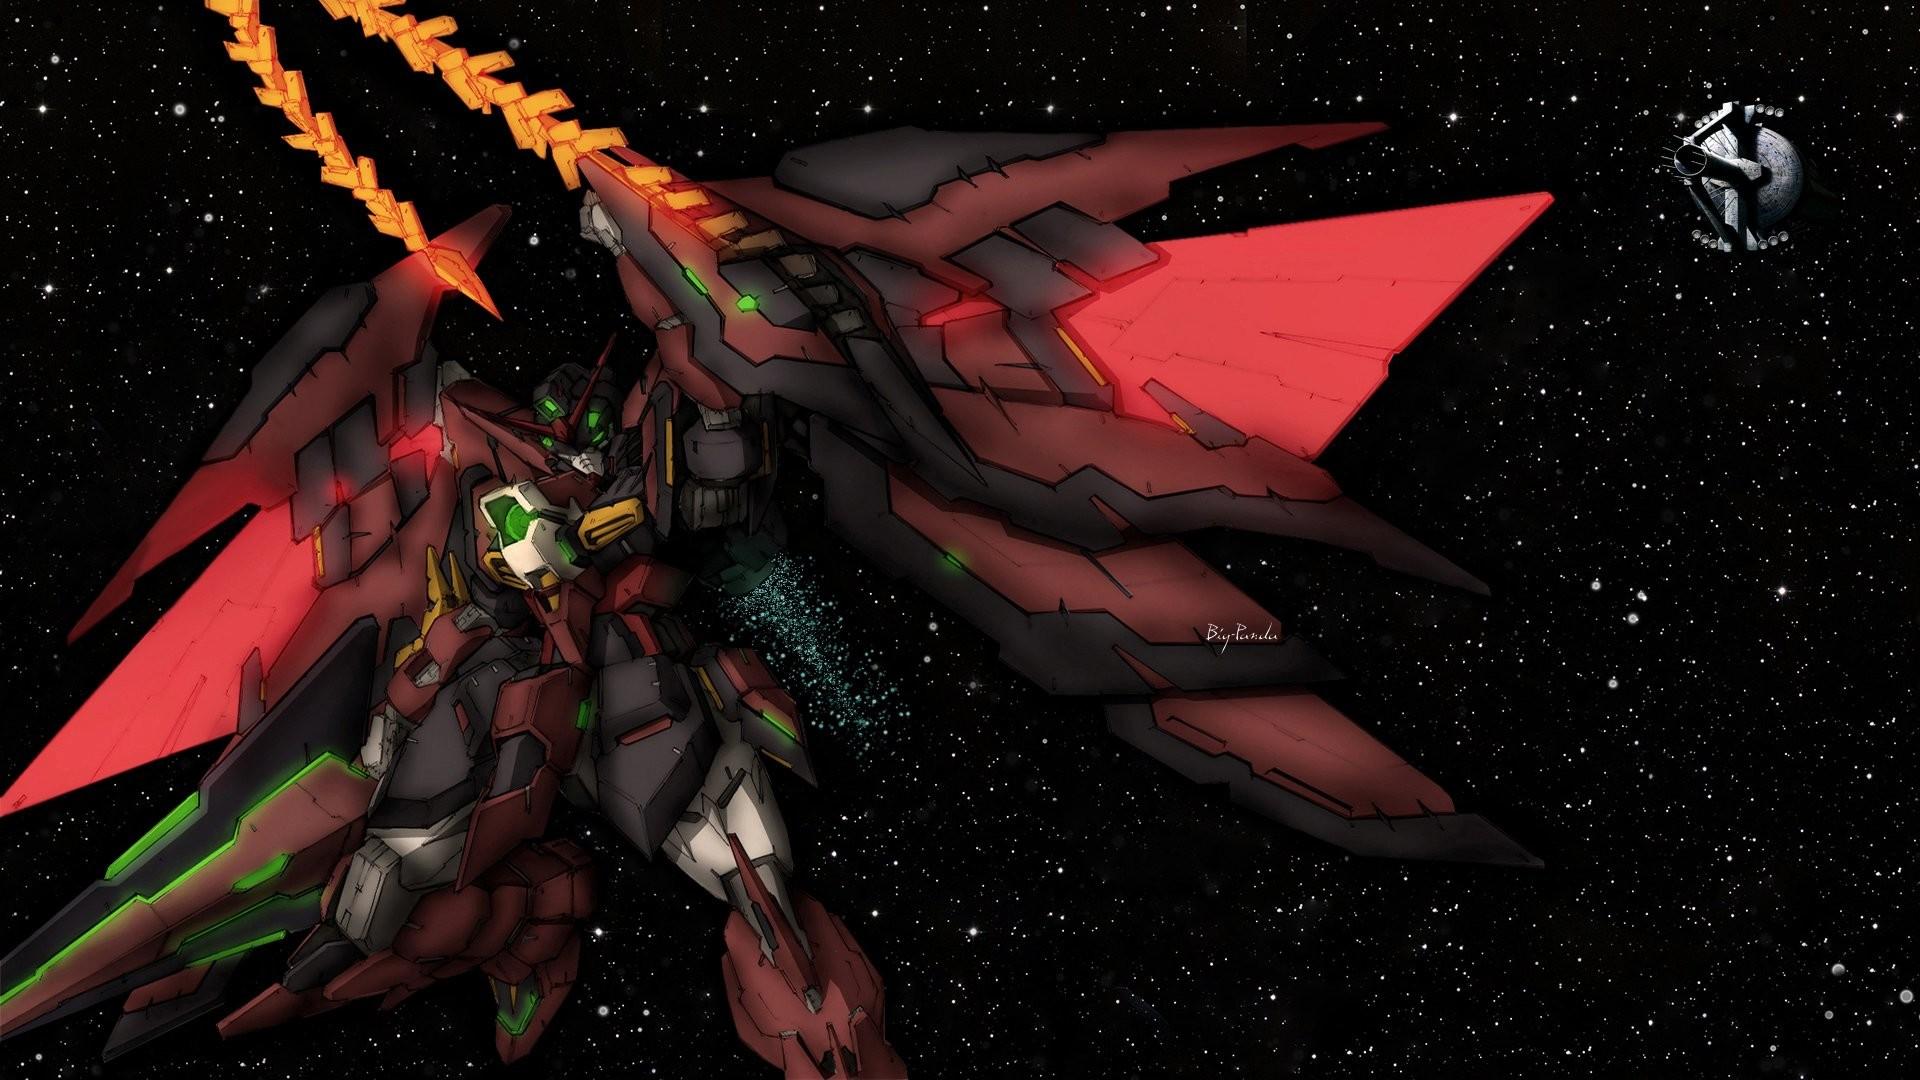 Gundam wing zero wallpaper wallpapertag - Anime mobile wallpaper ...